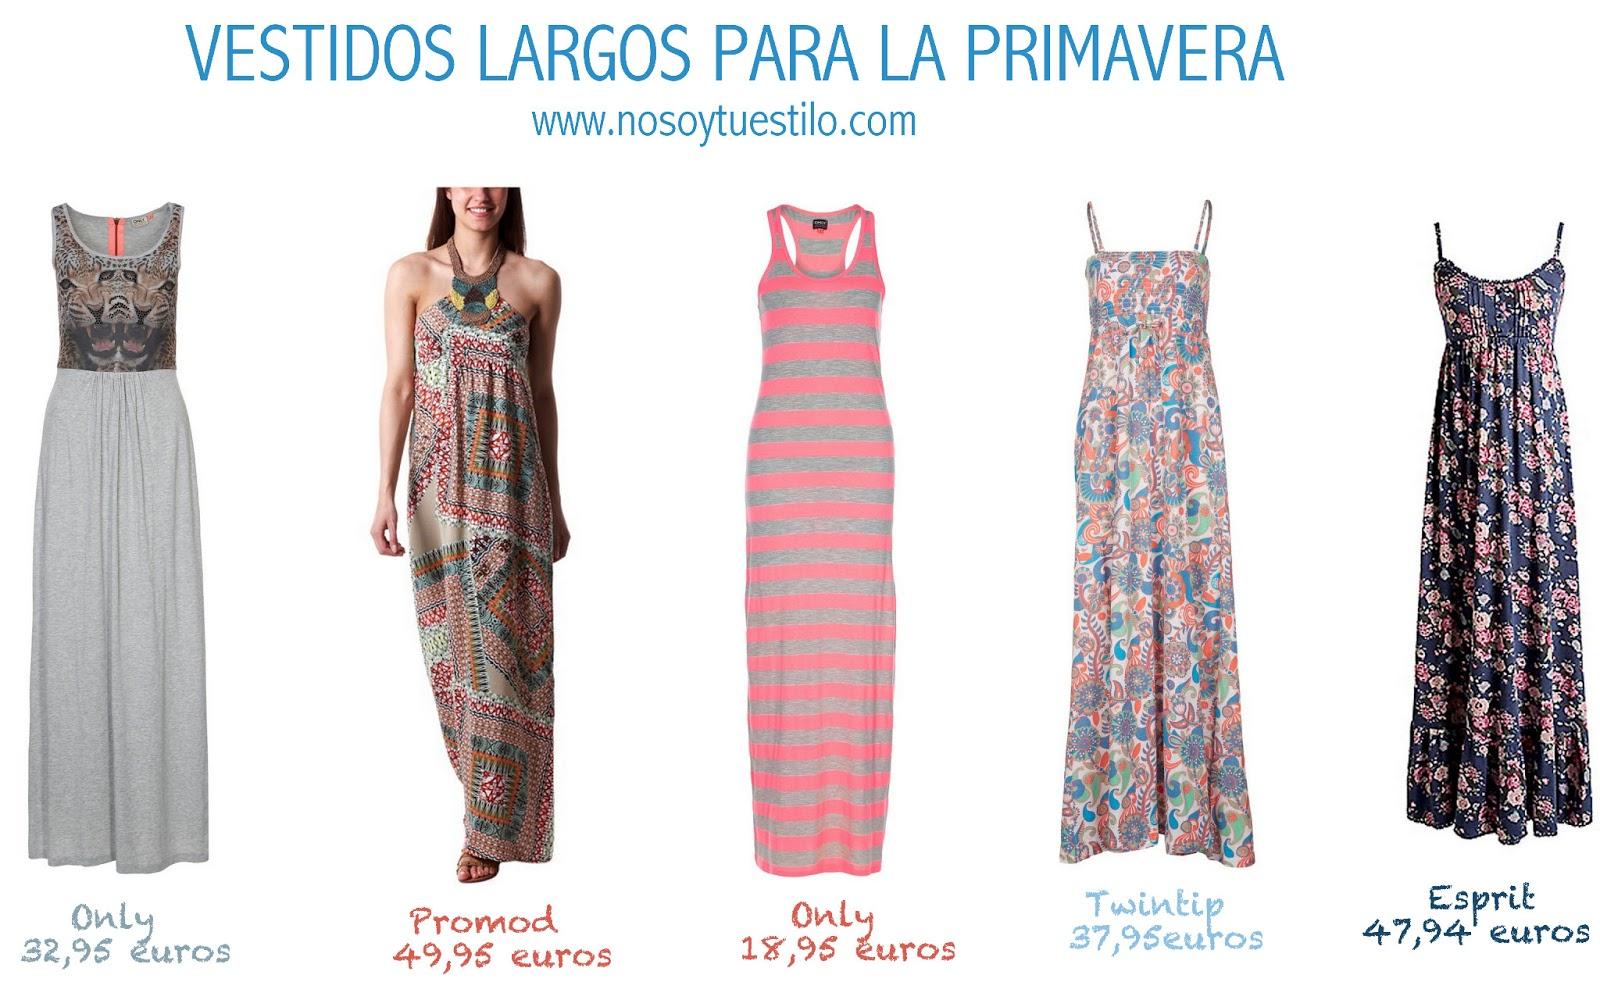 Vestidos largos para la primavera